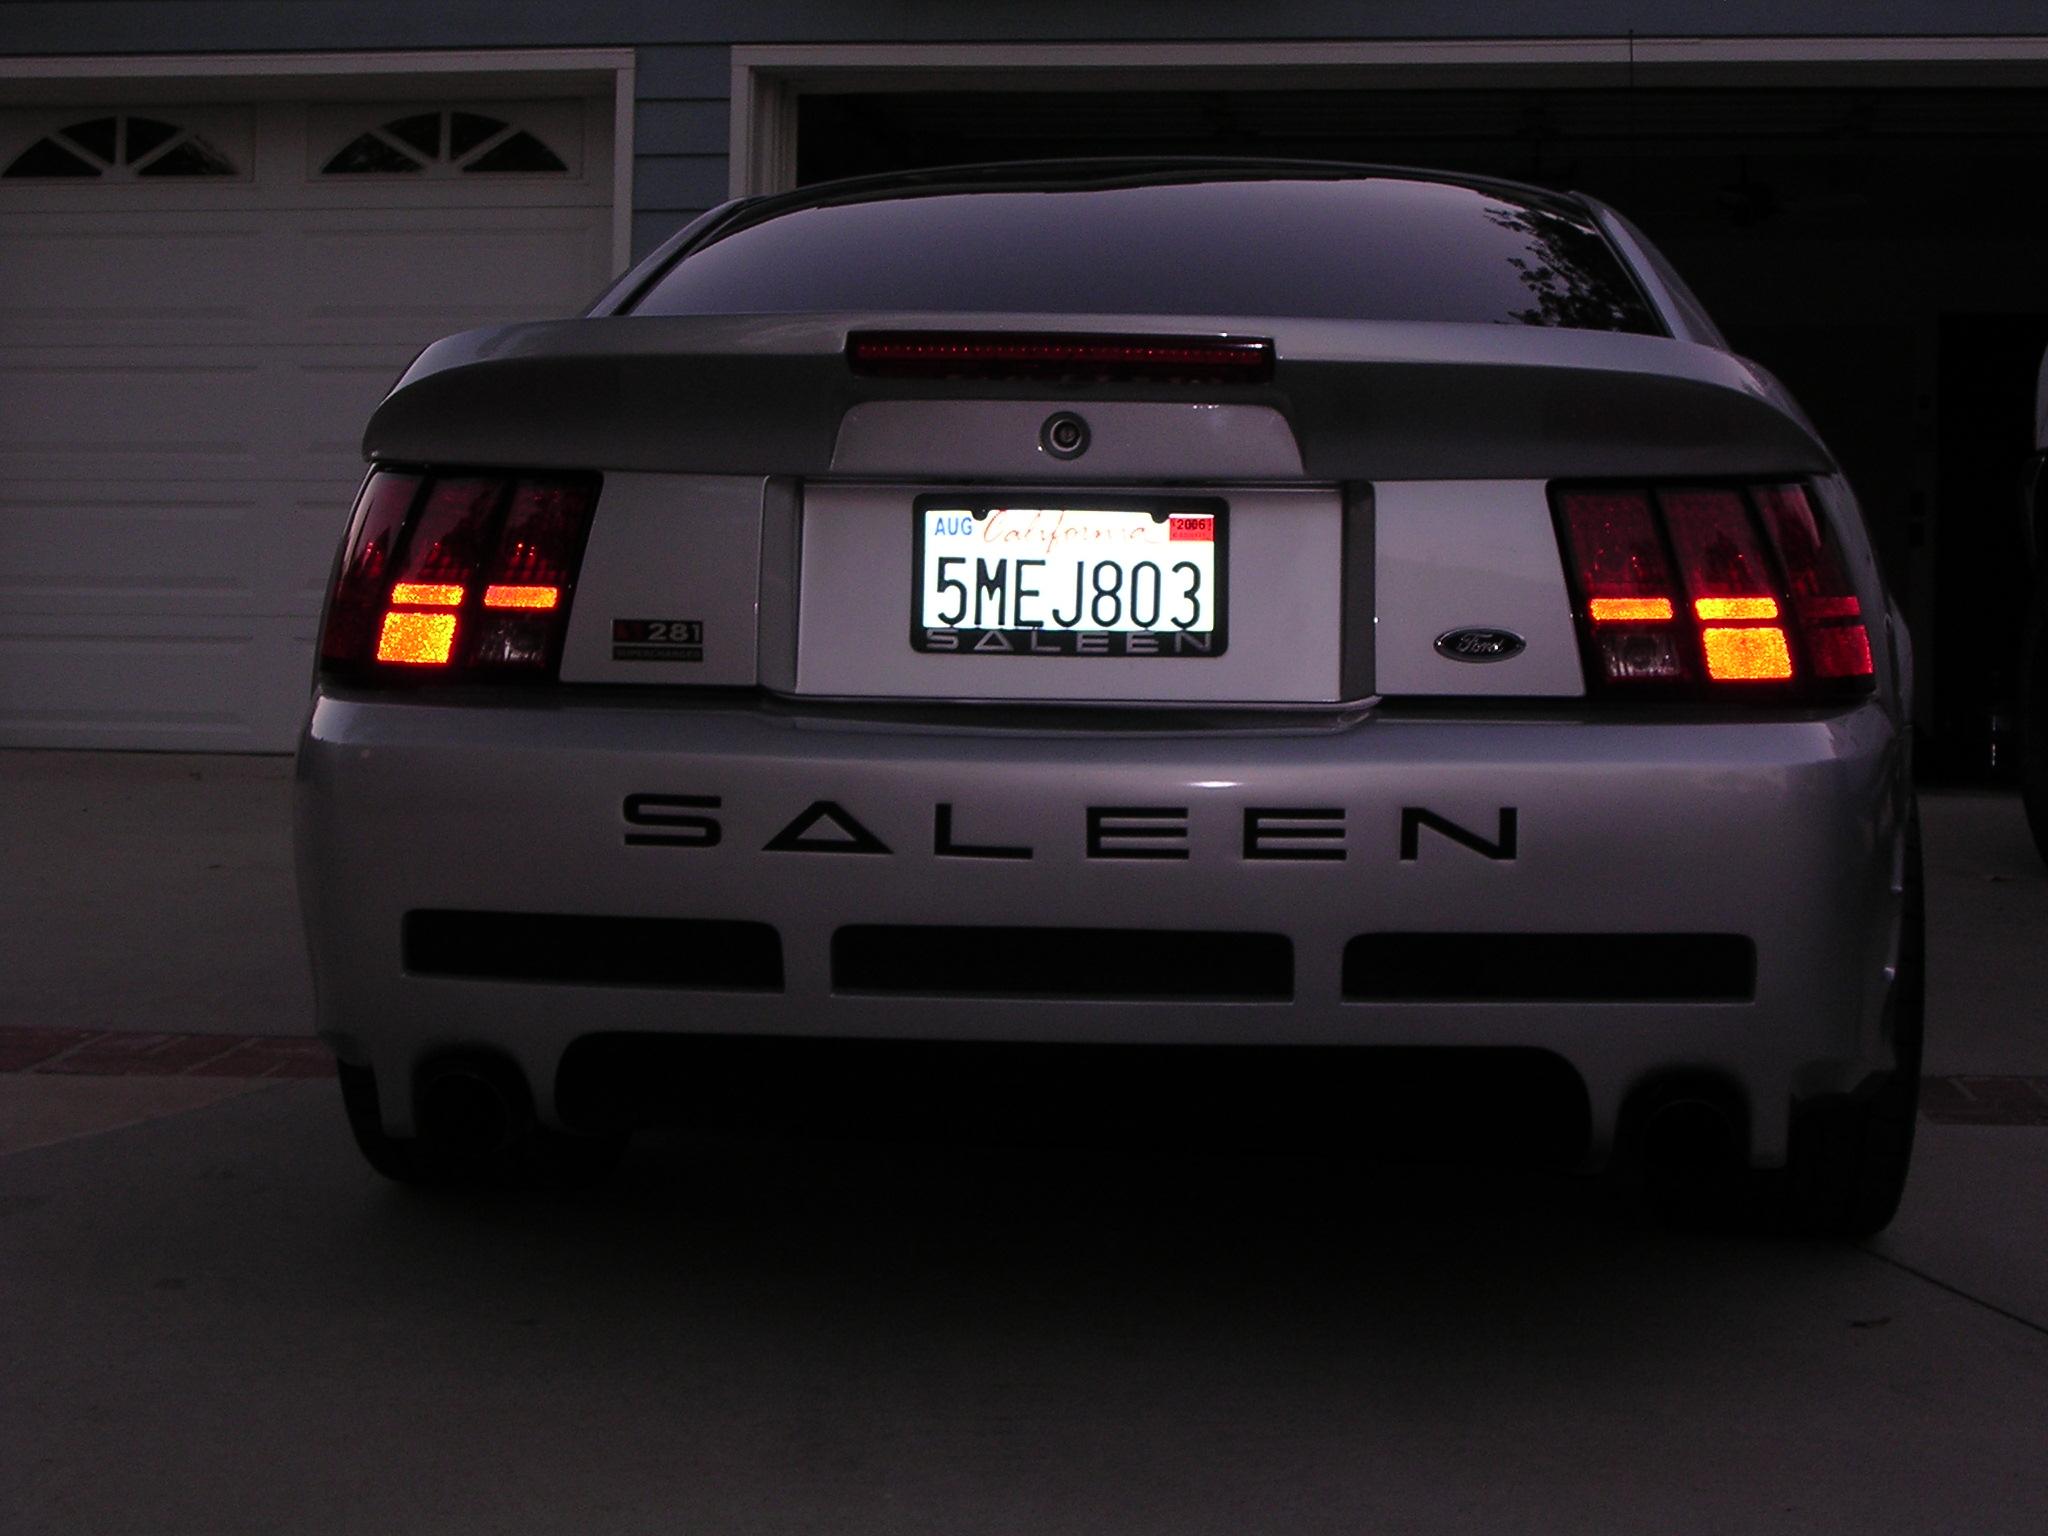 Click image for larger version  Name:saleen back 2.JPG Views:612 Size:596.5 KB ID:10419